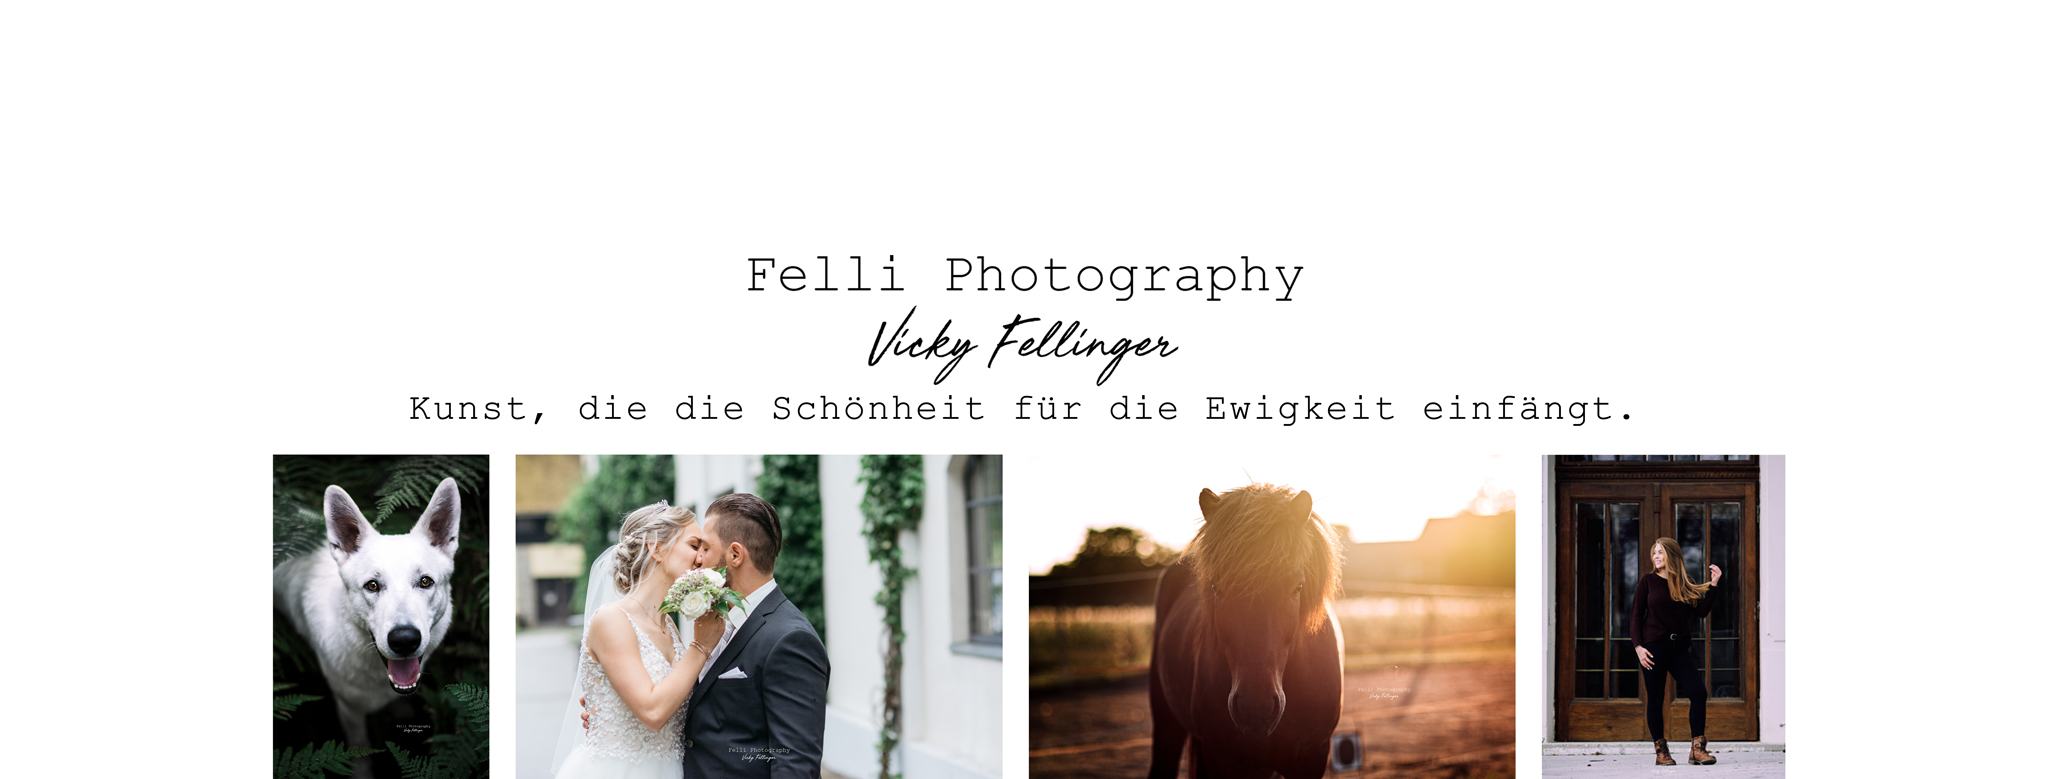 Felli Photography